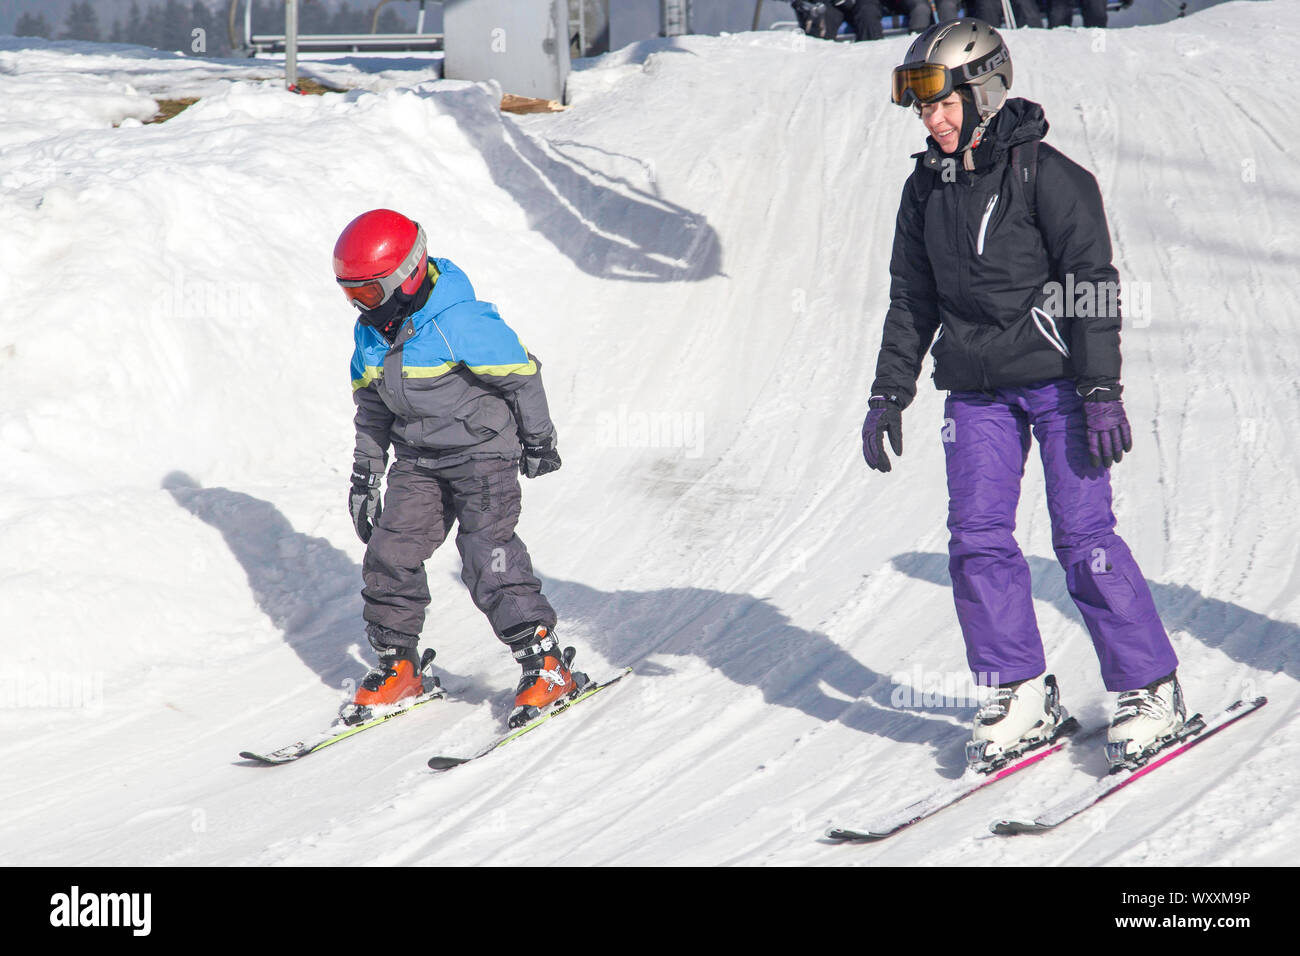 Spindleruv Mlyn / Czech Republic - Boy learning skiing in a czech ski resort. Stock Photo